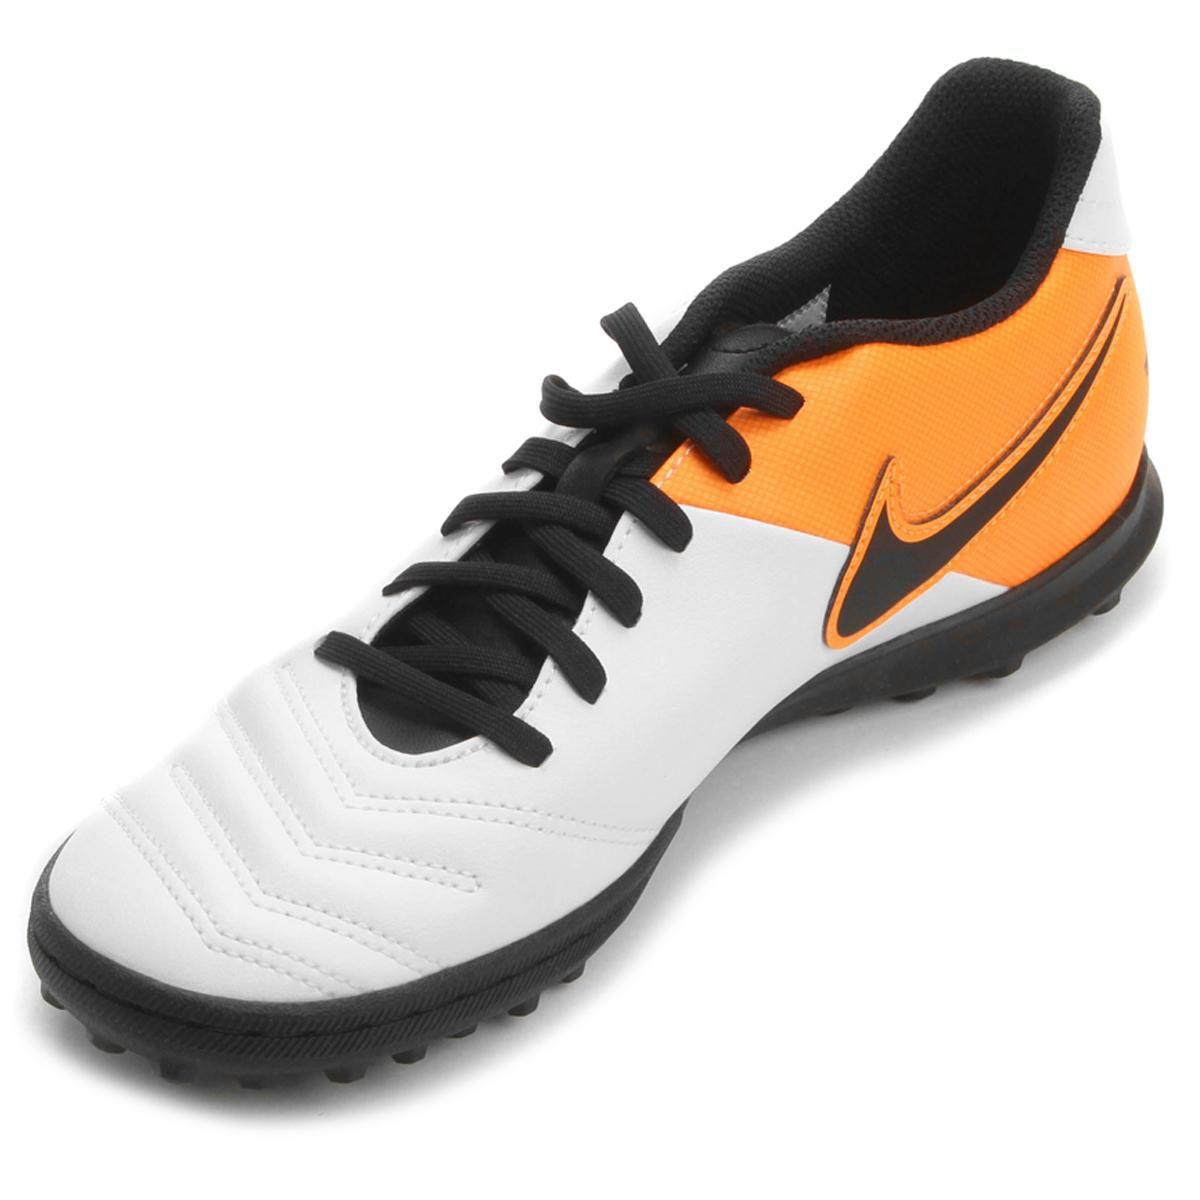 Chuteira Society Nike Tiempo Rio 3 TF Masculina - BRACIA SHOP  Loja ... cd69b1fb96f7c